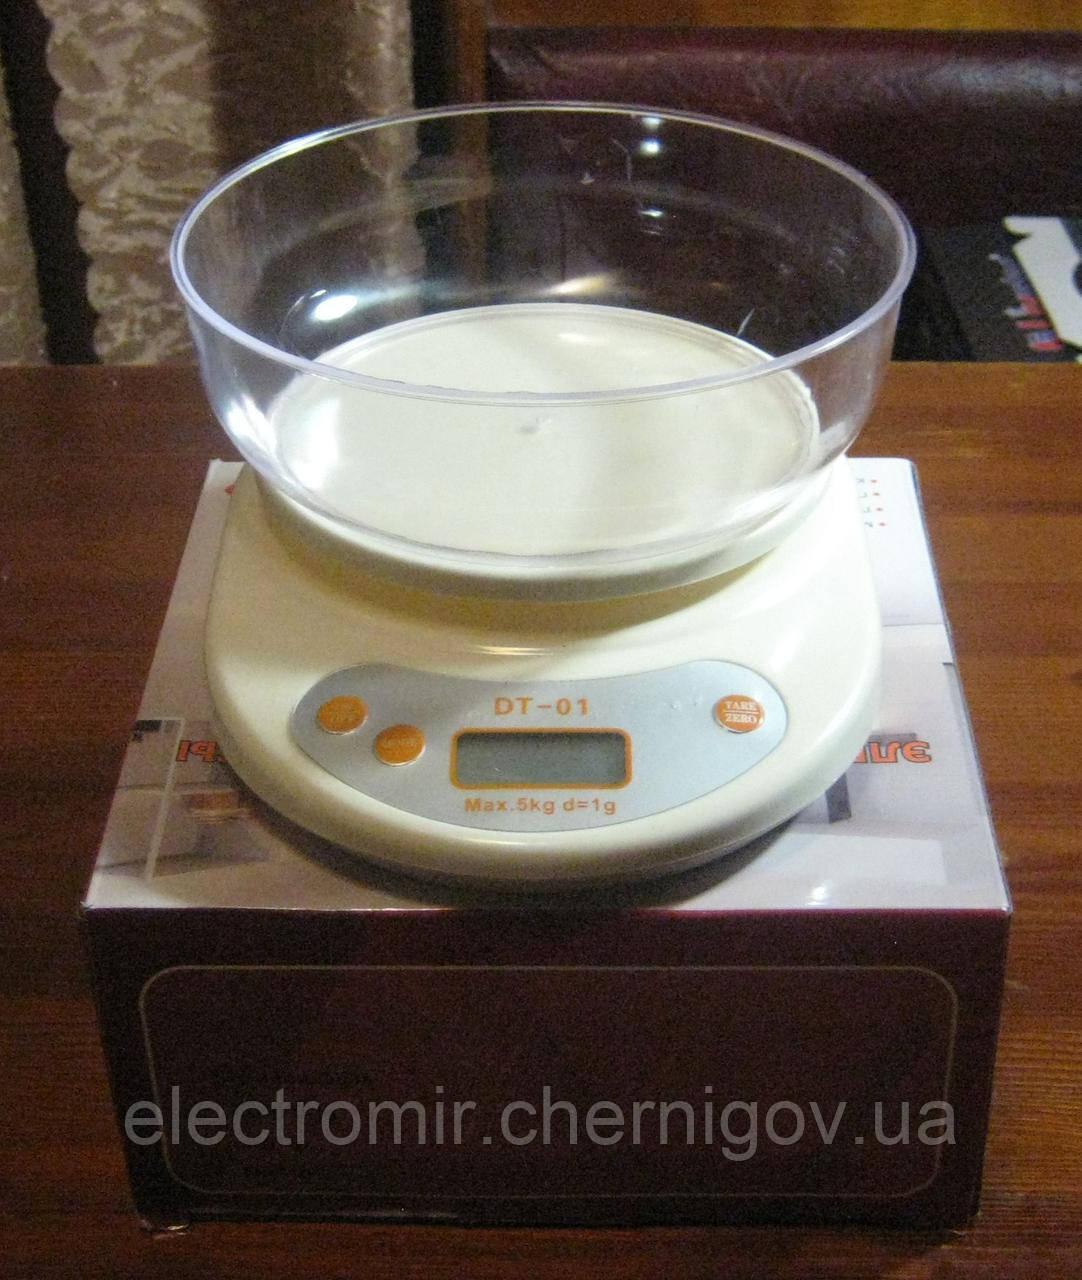 Весы кухонные электронные с чашей D&T DT-01 (до 5 кг)